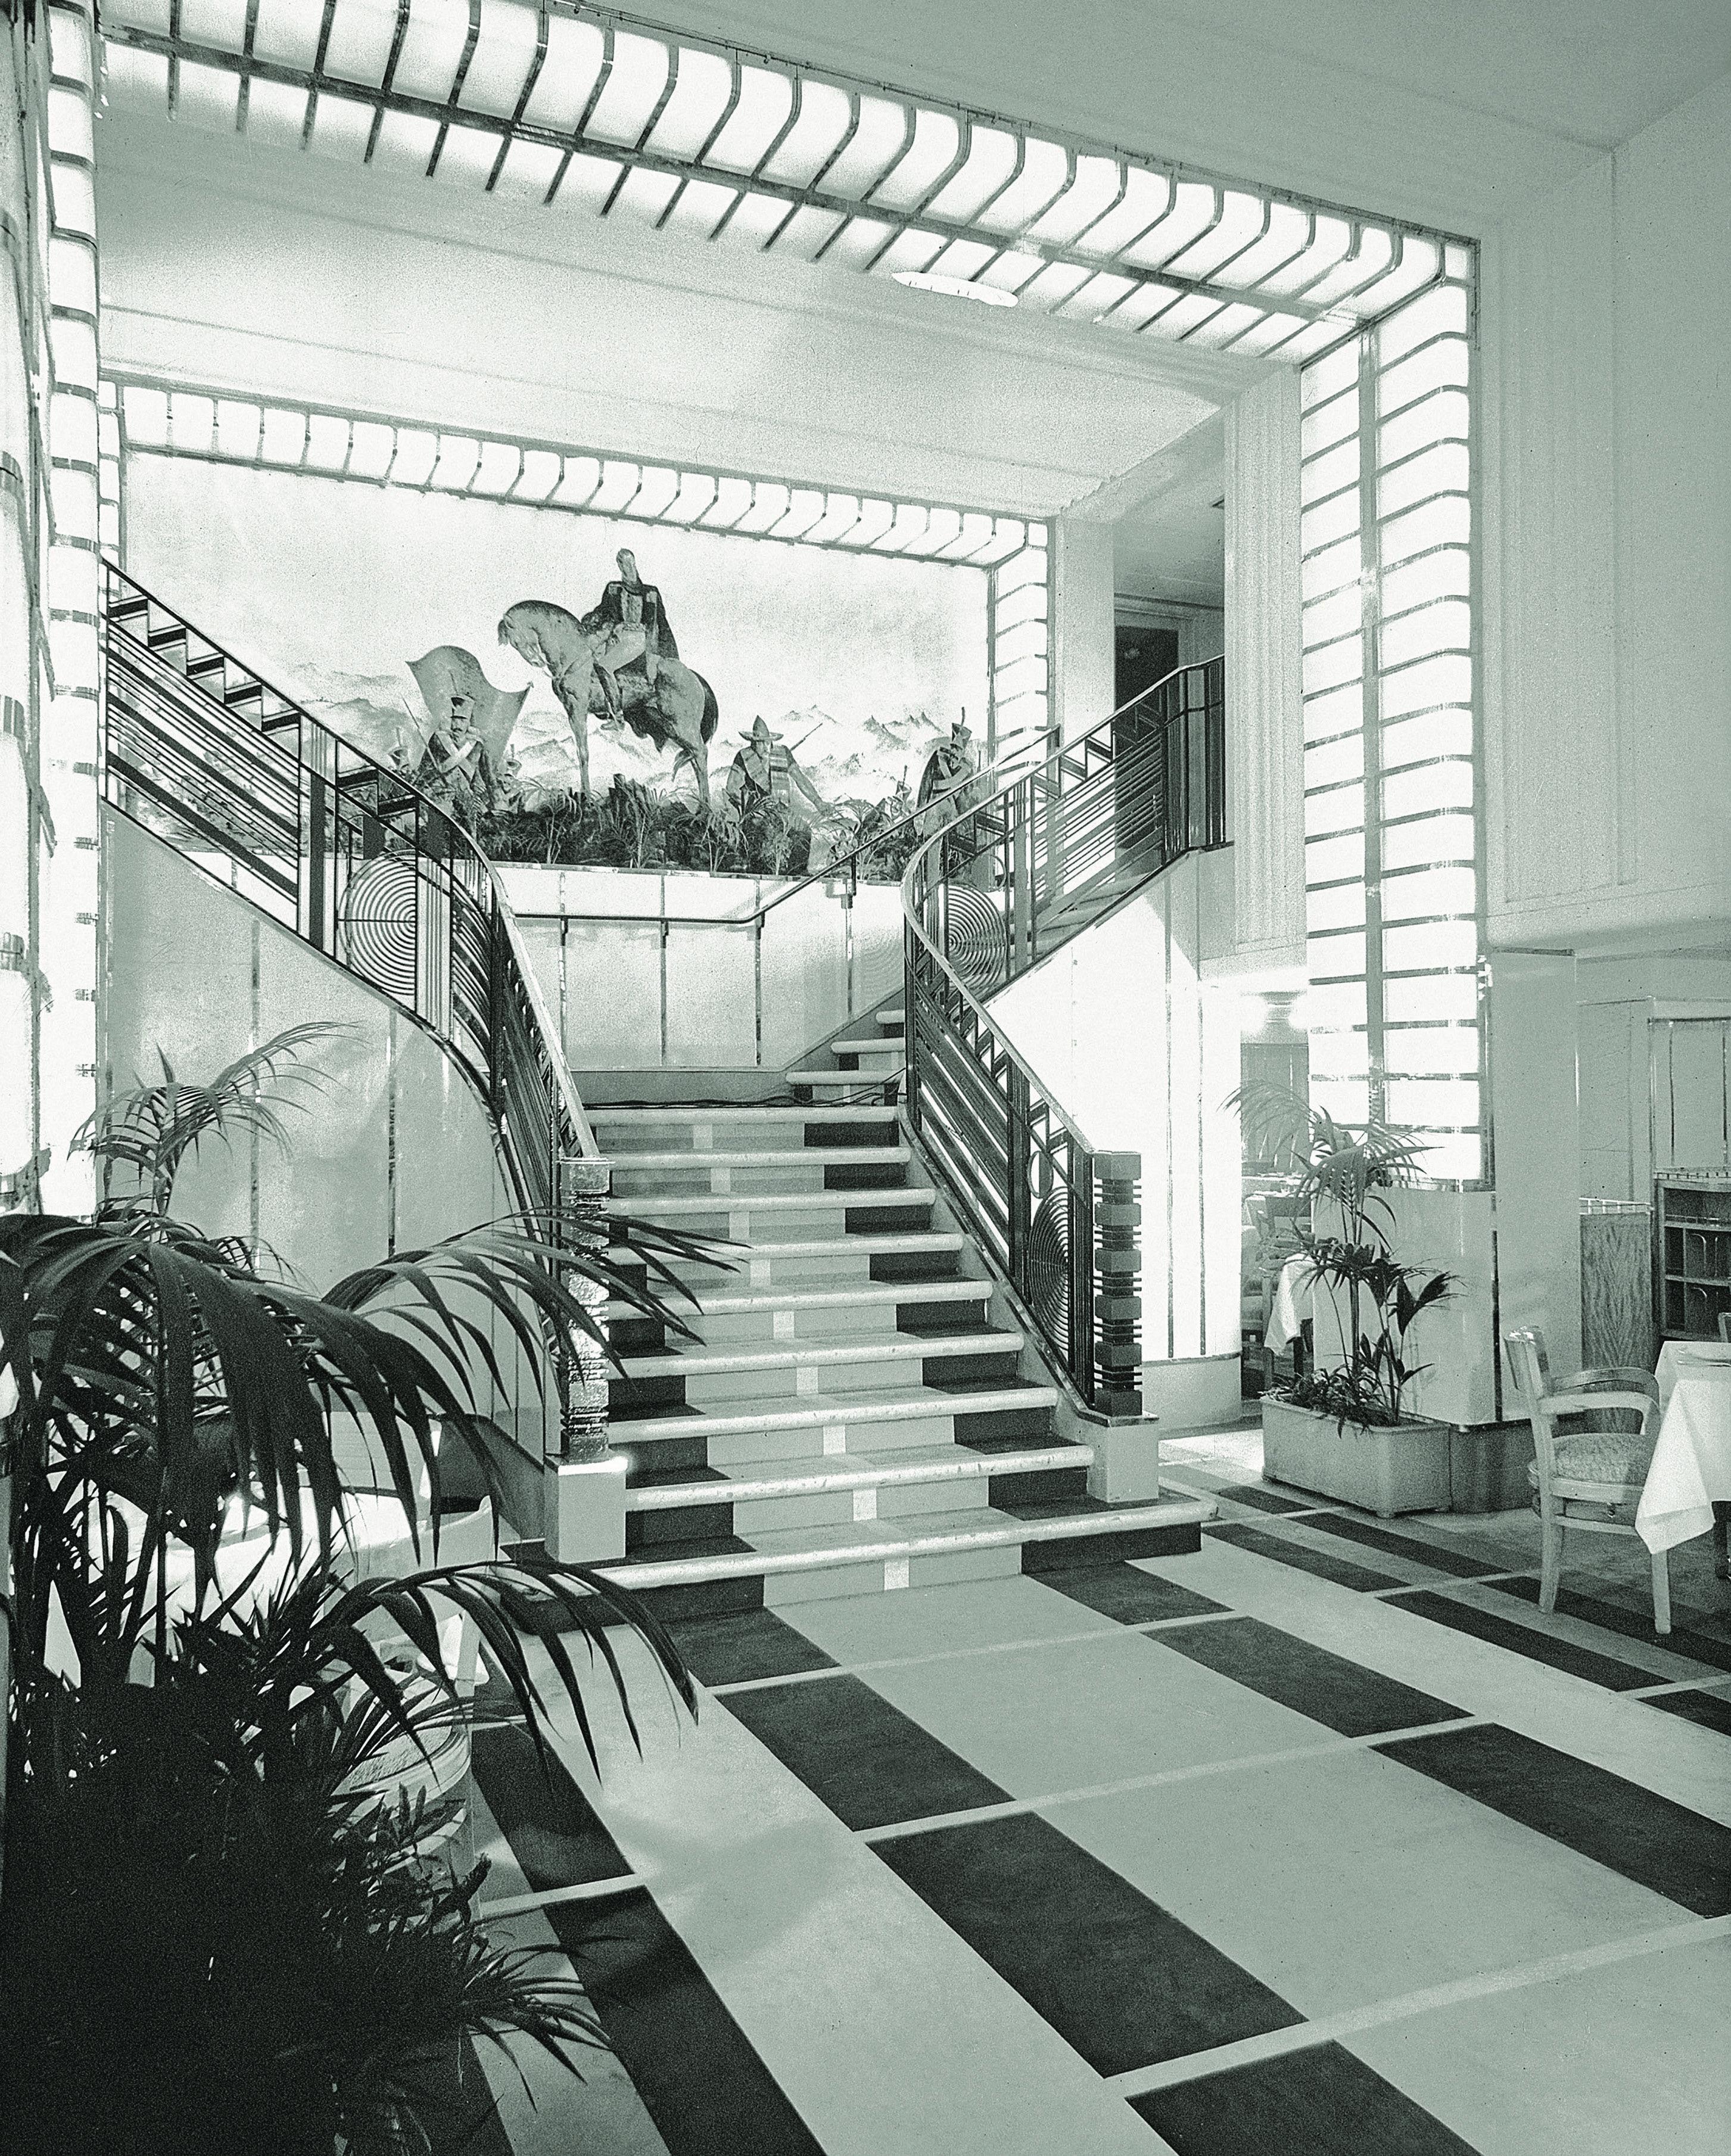 La maison pierre frey a family heritage rené prou avant garde decorator from